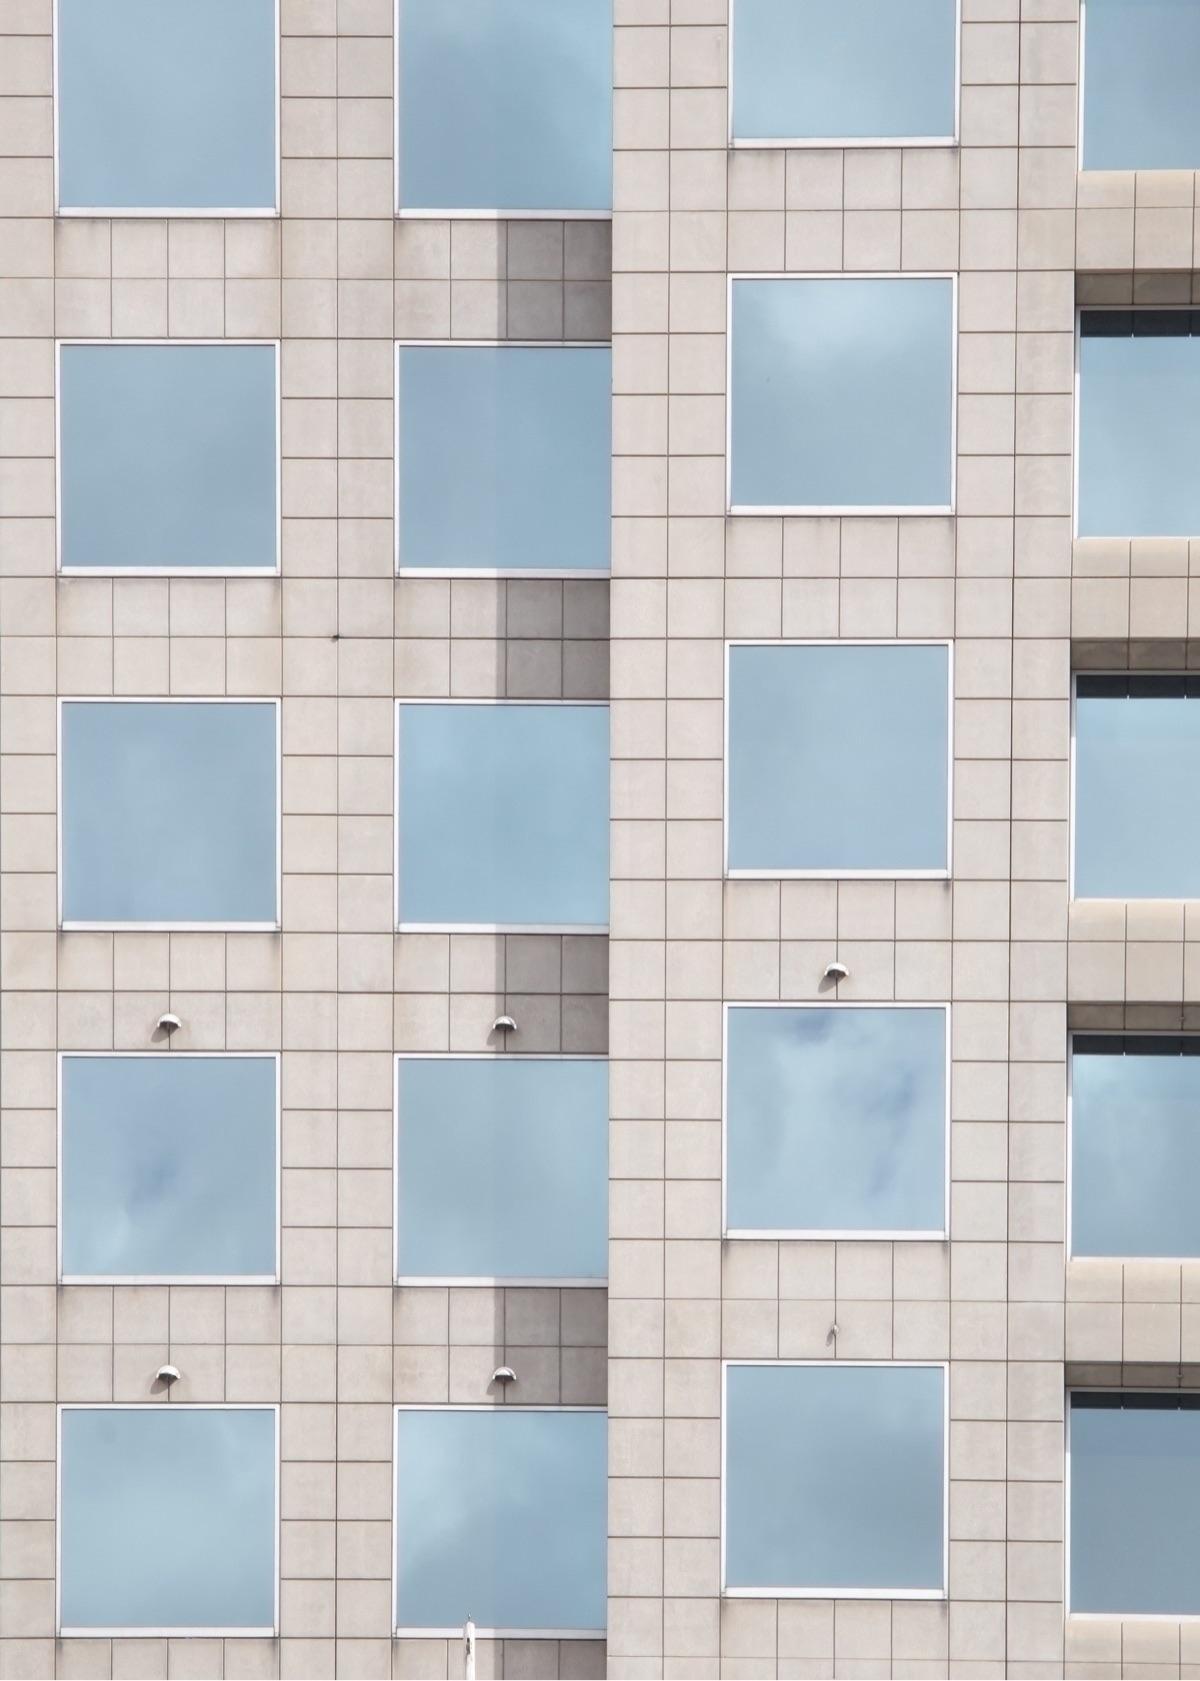 minimal, facade, melbourne, melbournephotographer - jokalinowski_ | ello